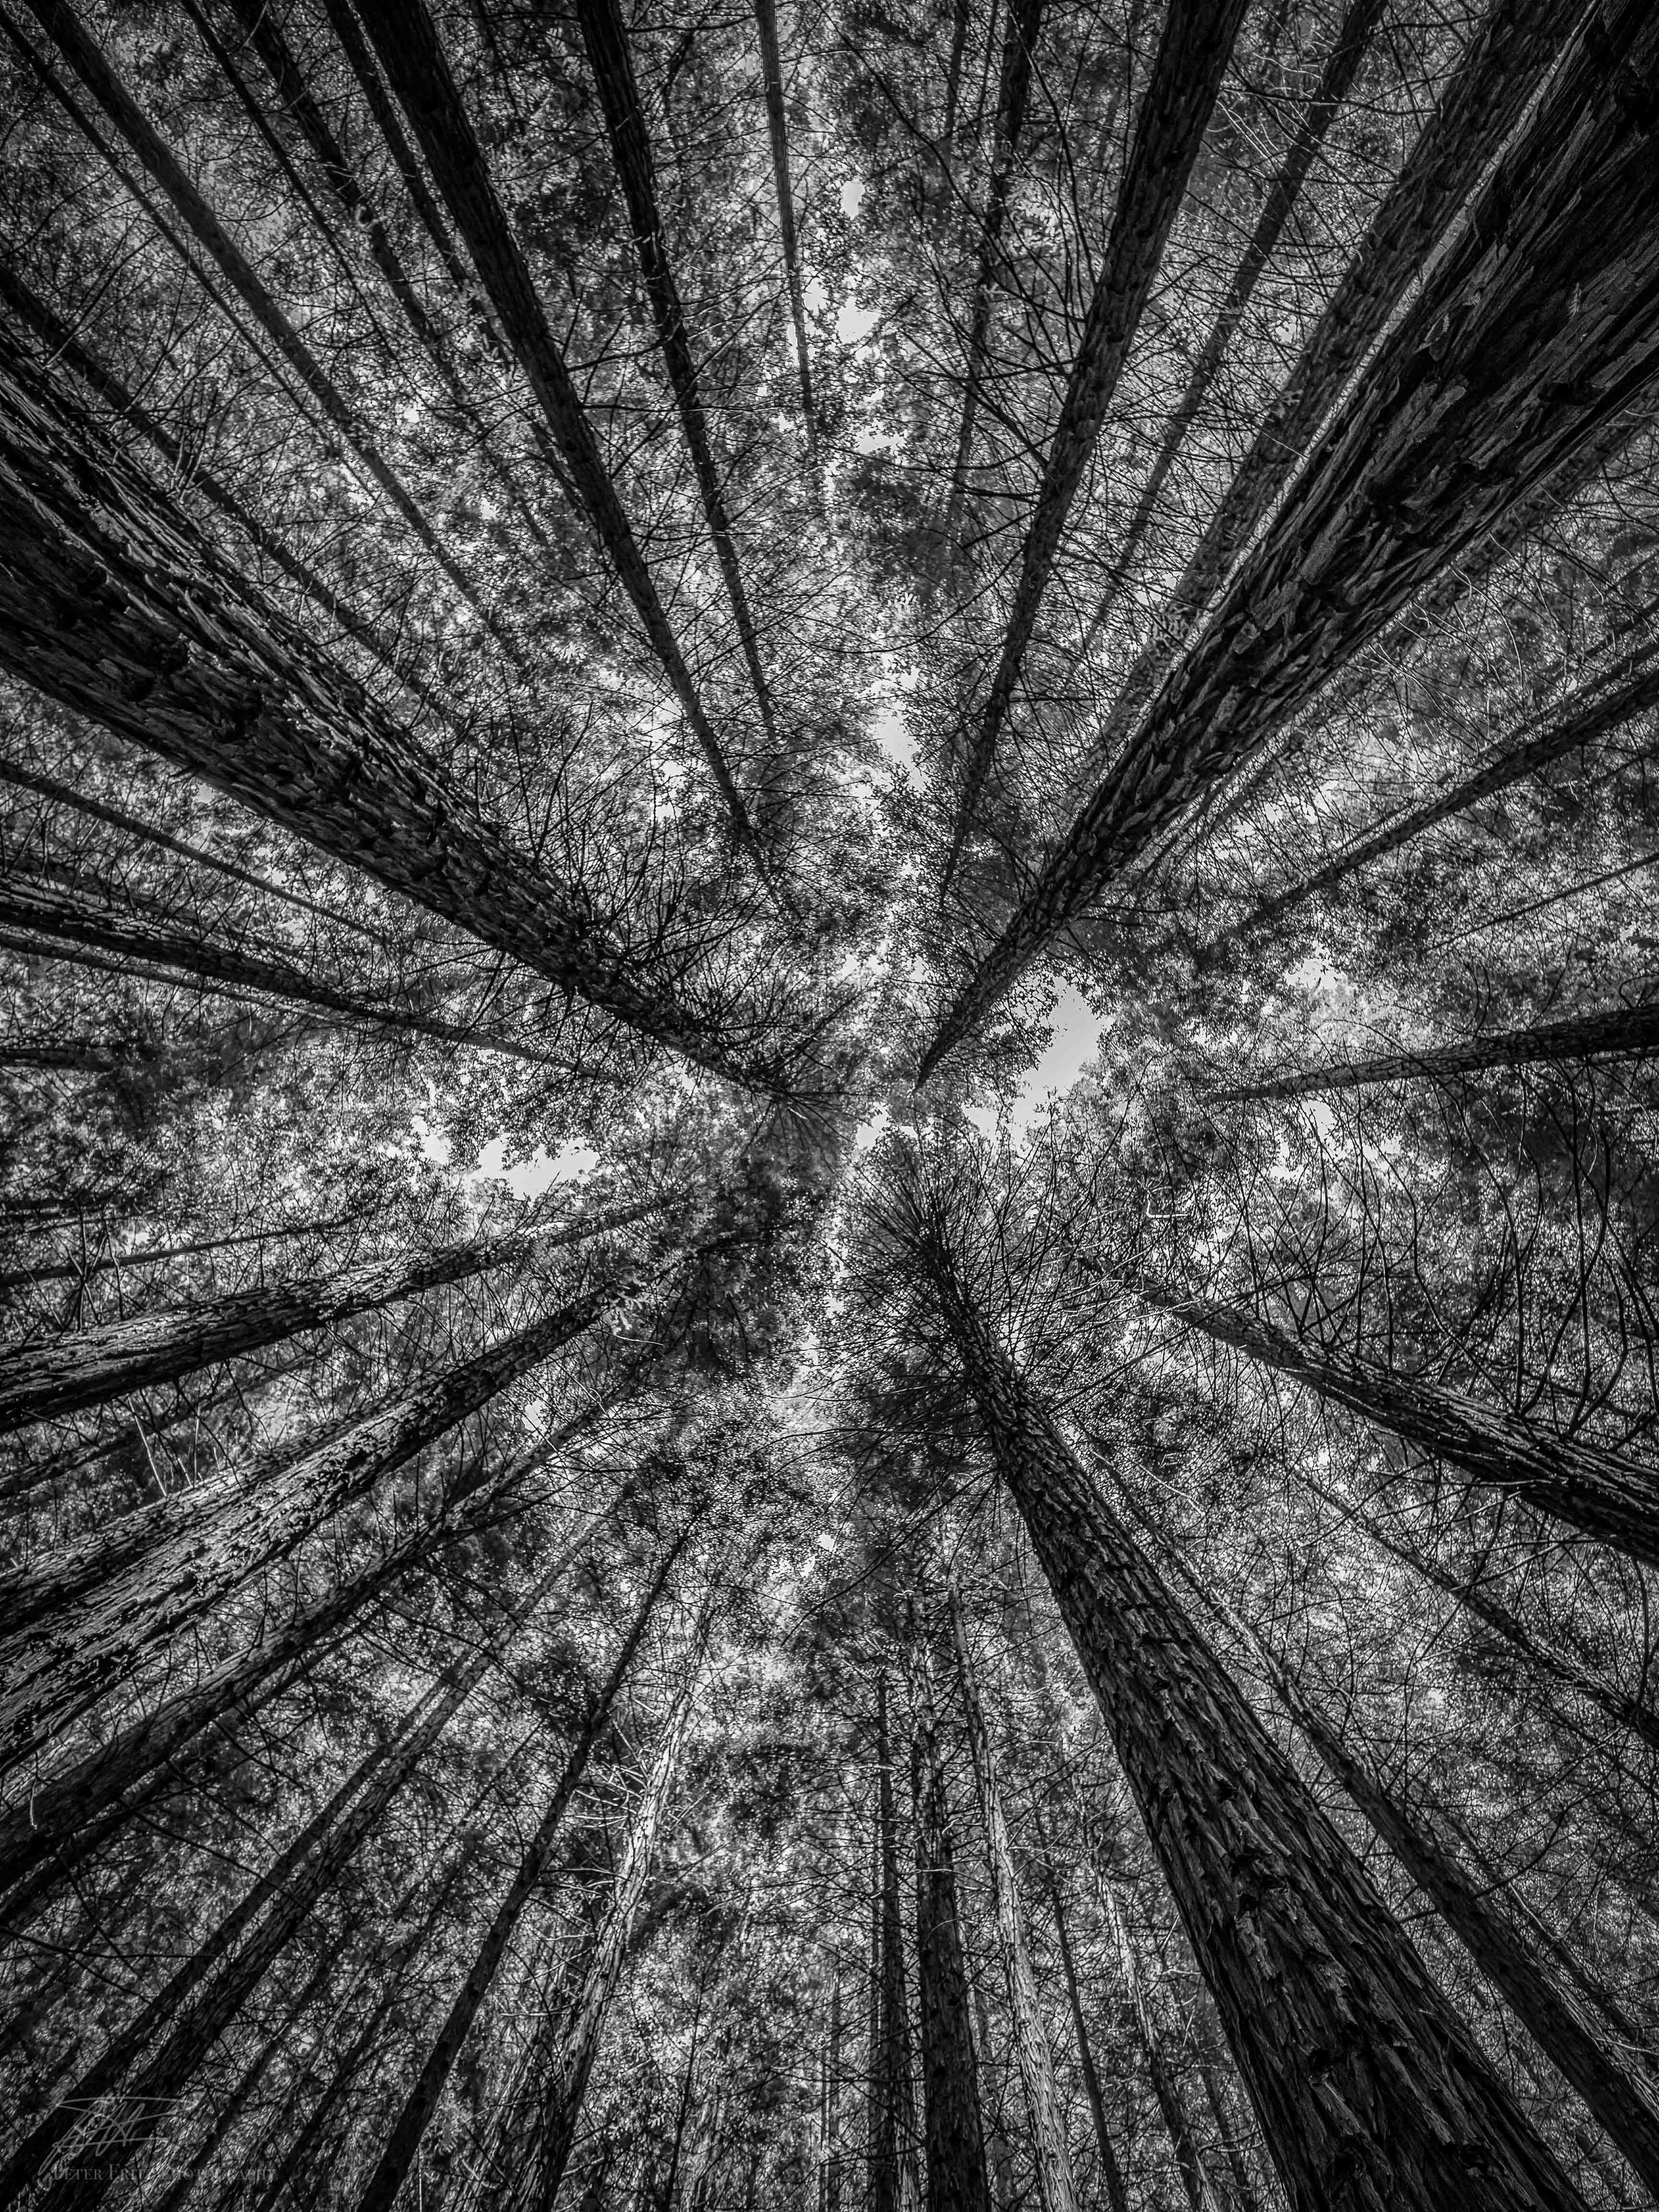 Redwoods up bnw 4x3 web.jpg